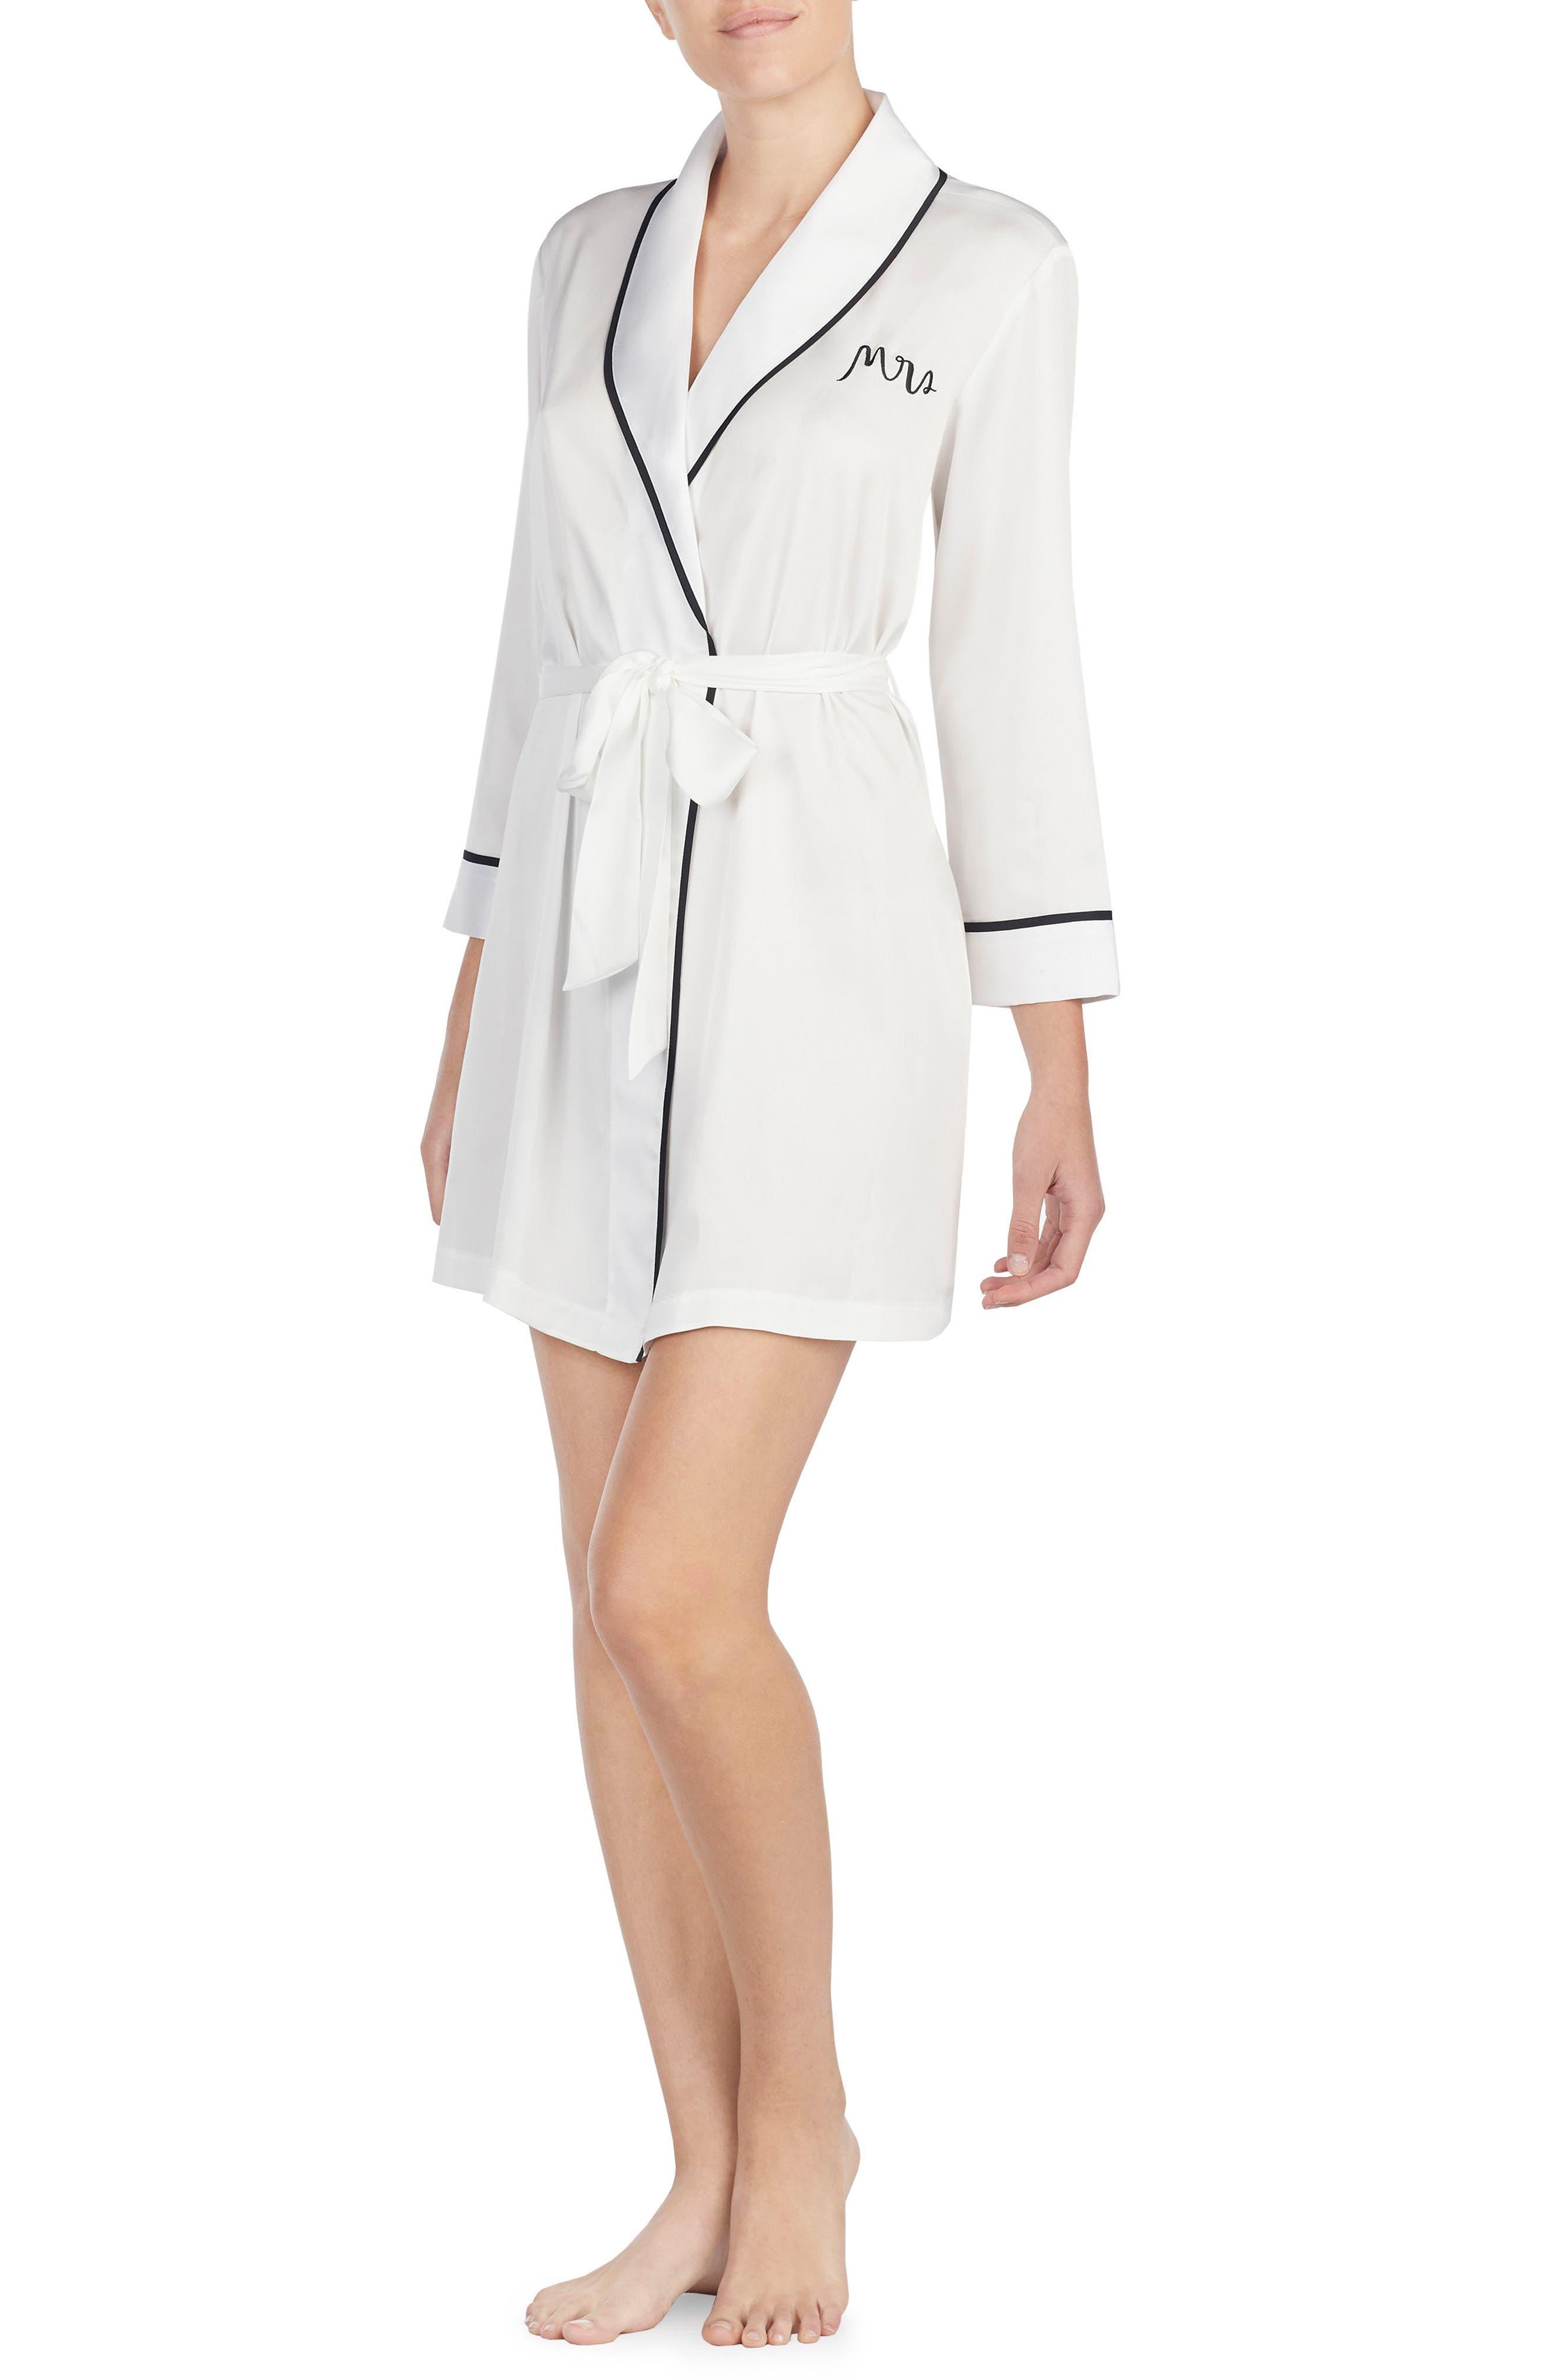 mrs charmeuse short robe,                         Main,                         color,